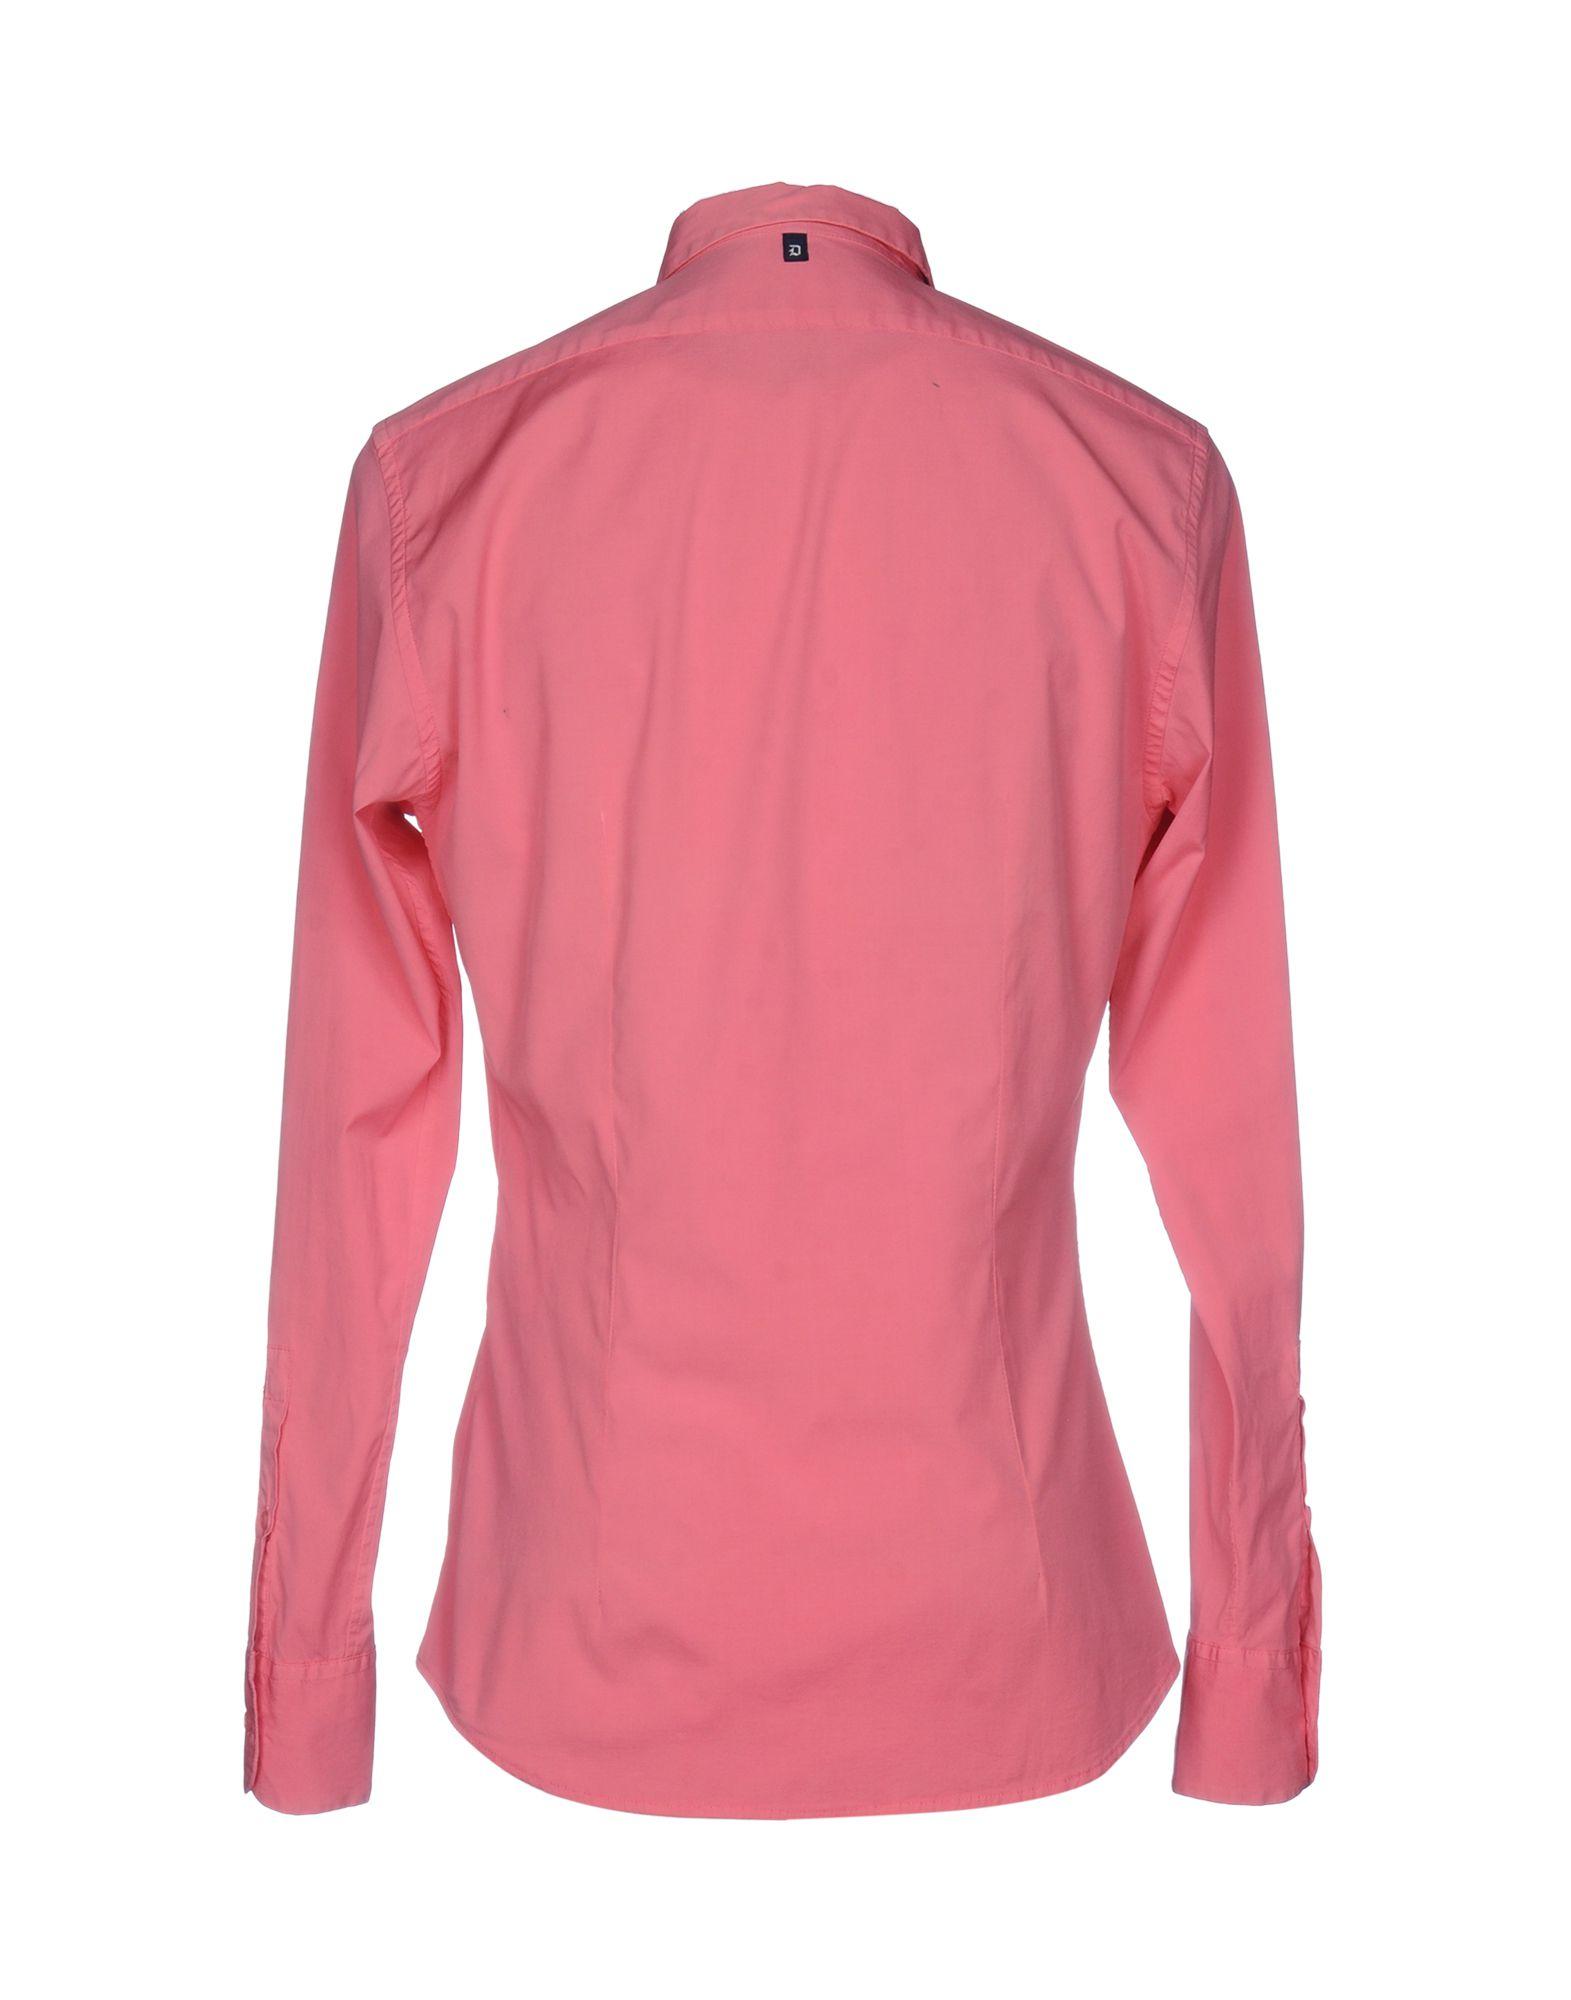 Camicia Tinta Unita Unita Unita Dondup Uomo - 38594652PJ 5c16b4